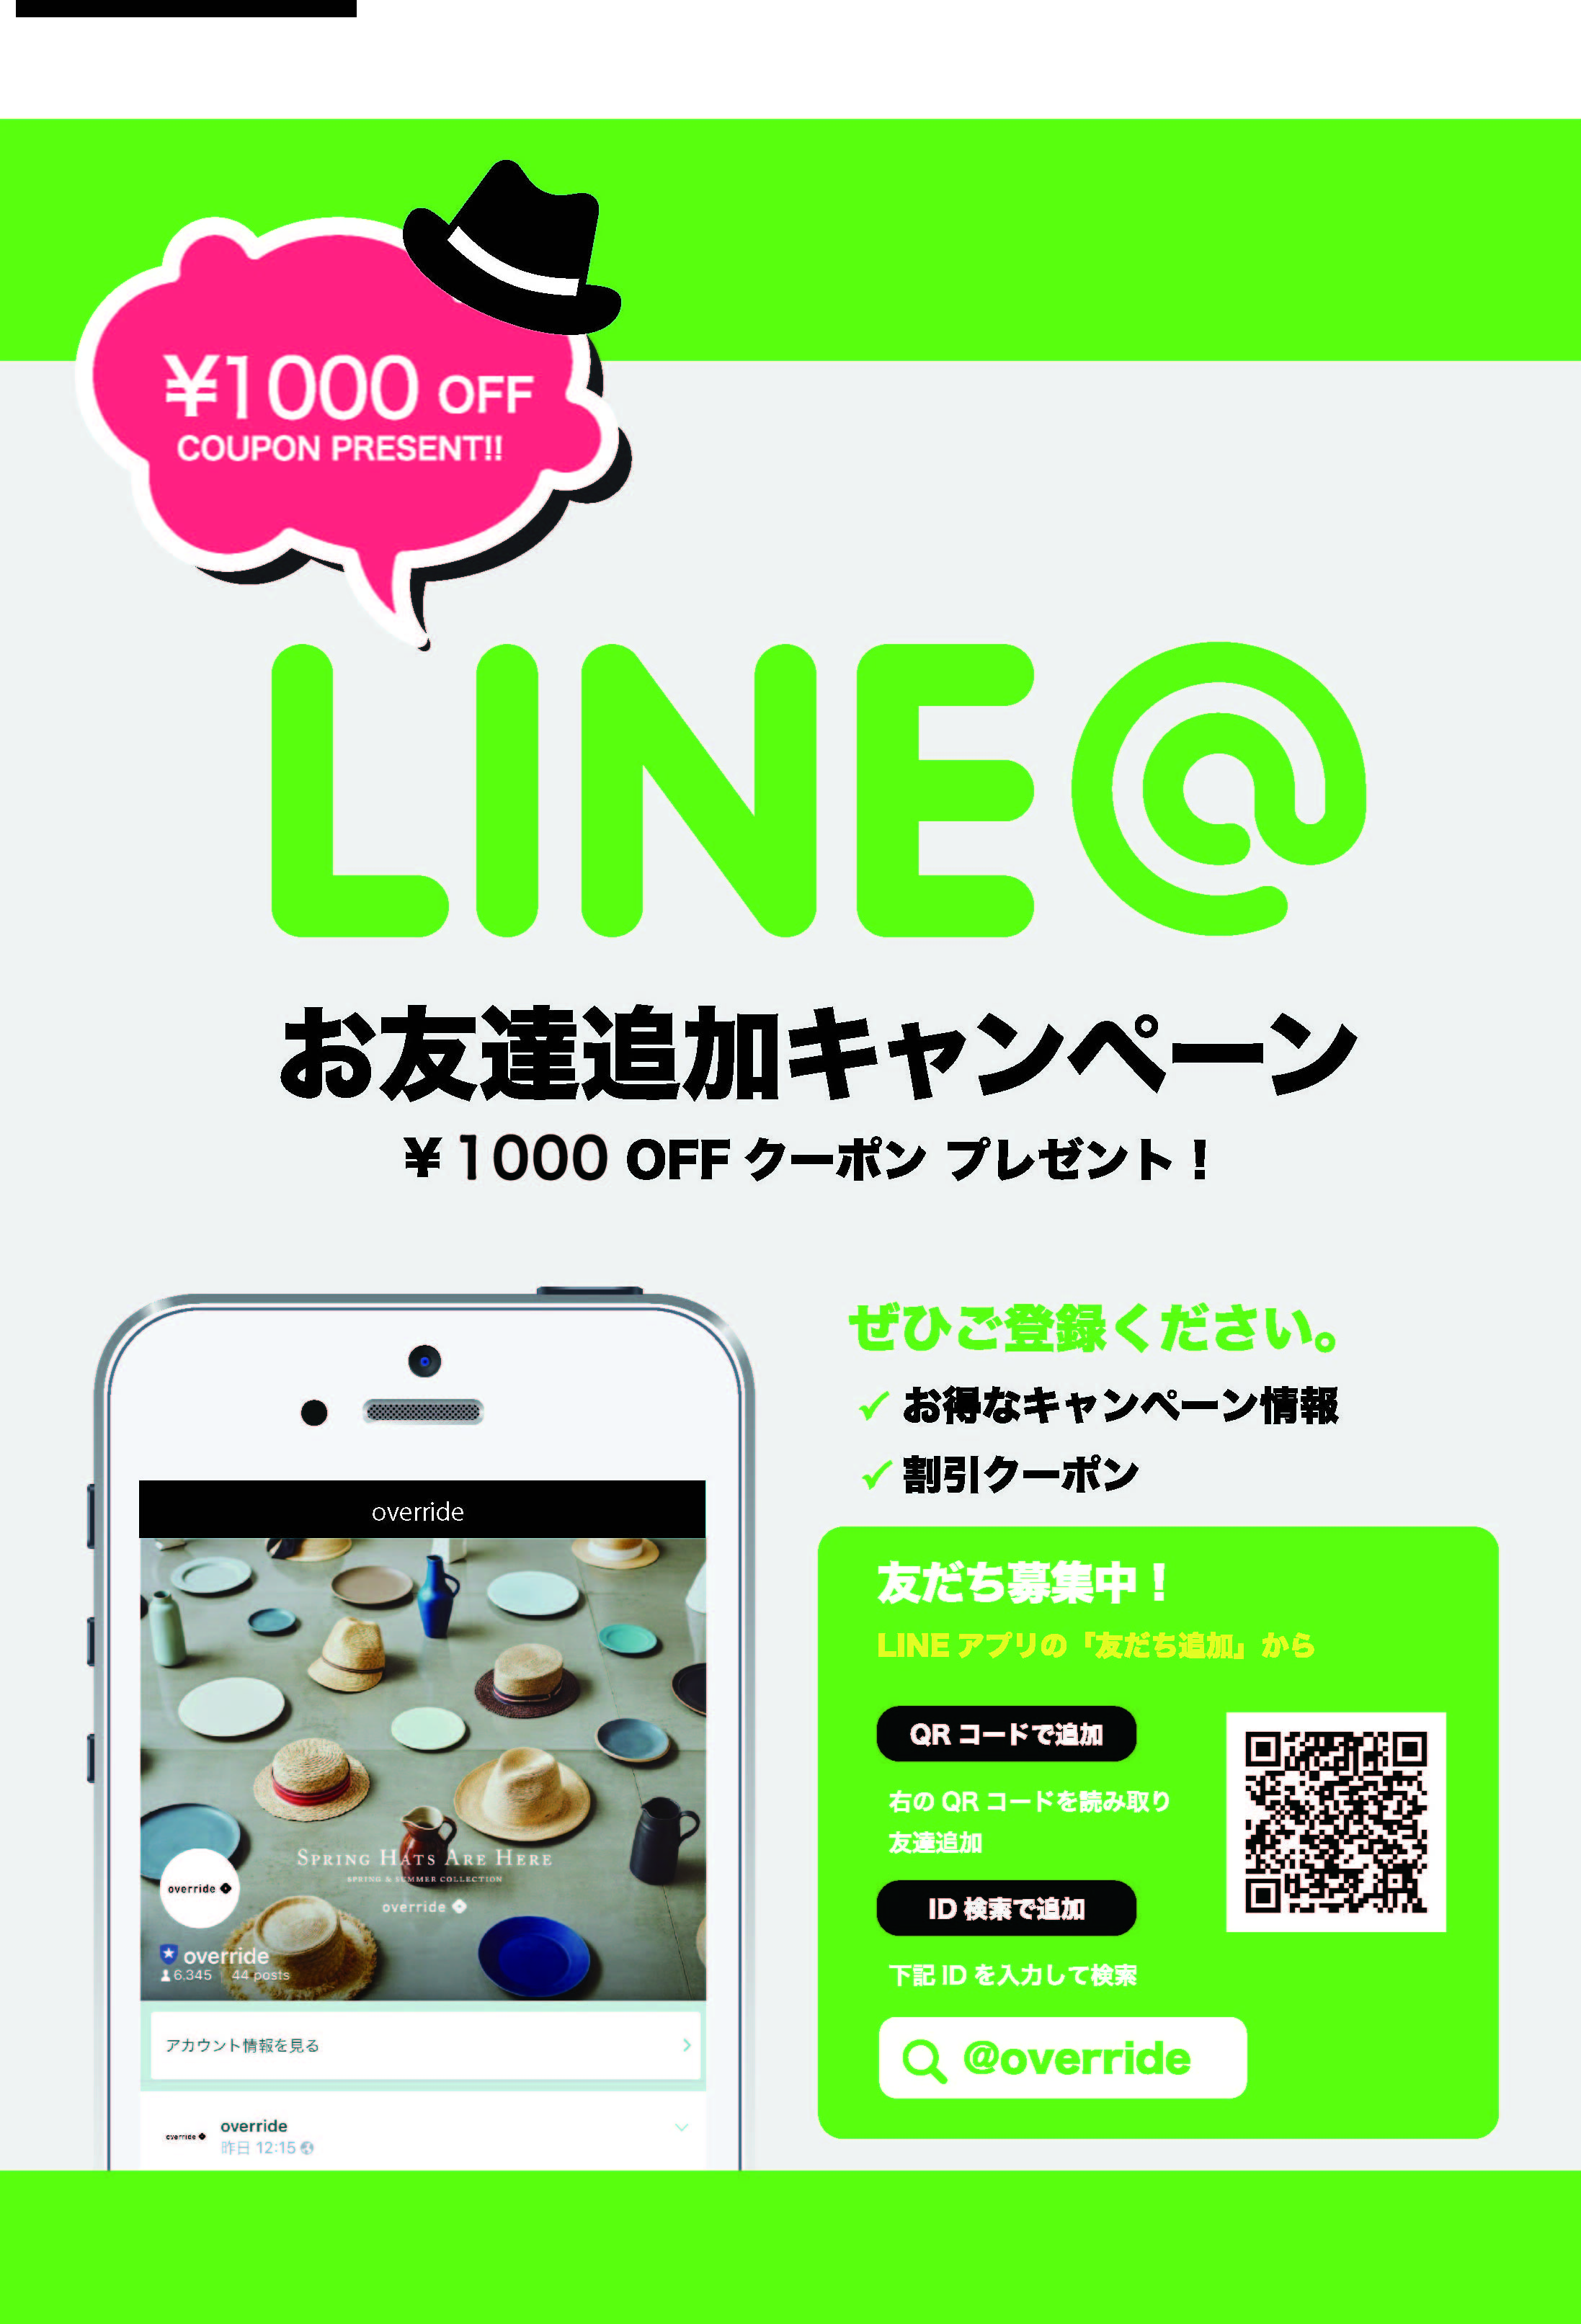 override南堀江店・明治通り店・オンラインストア限定LINE@1,000円OFFクーポンキャンペーン